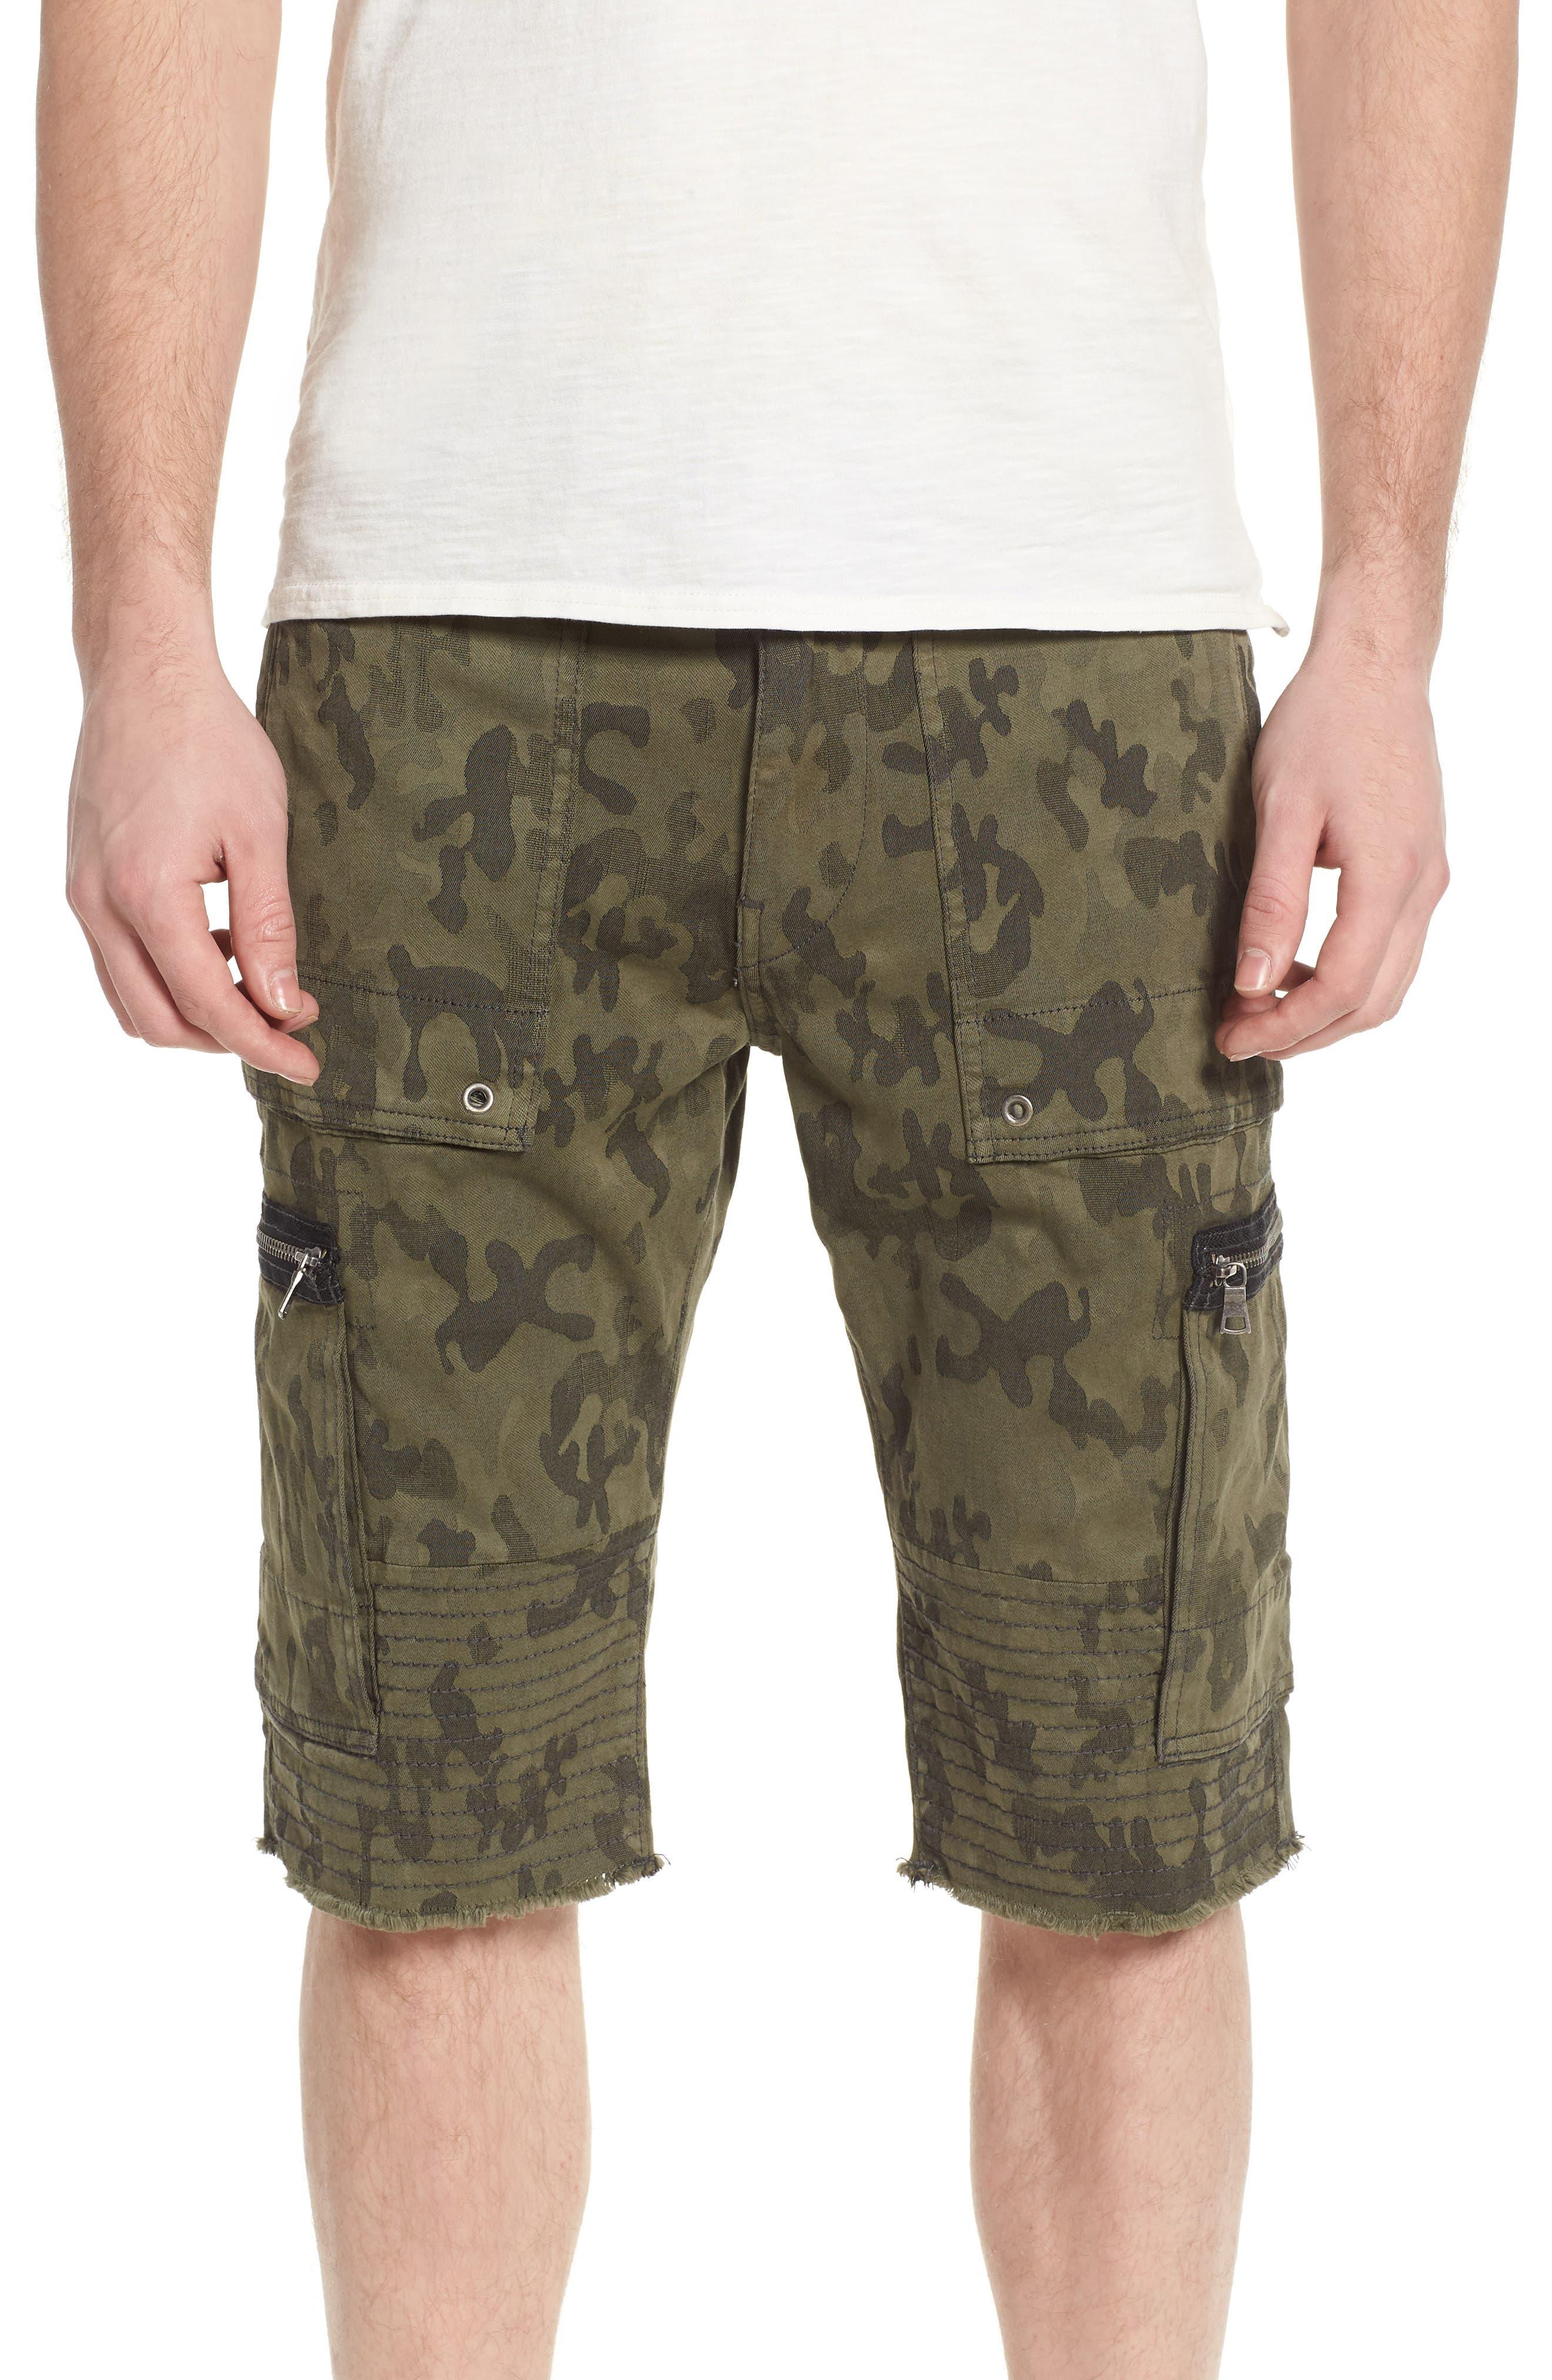 Touring Moto Shorts,                             Main thumbnail 1, color,                             Eph Mist Green